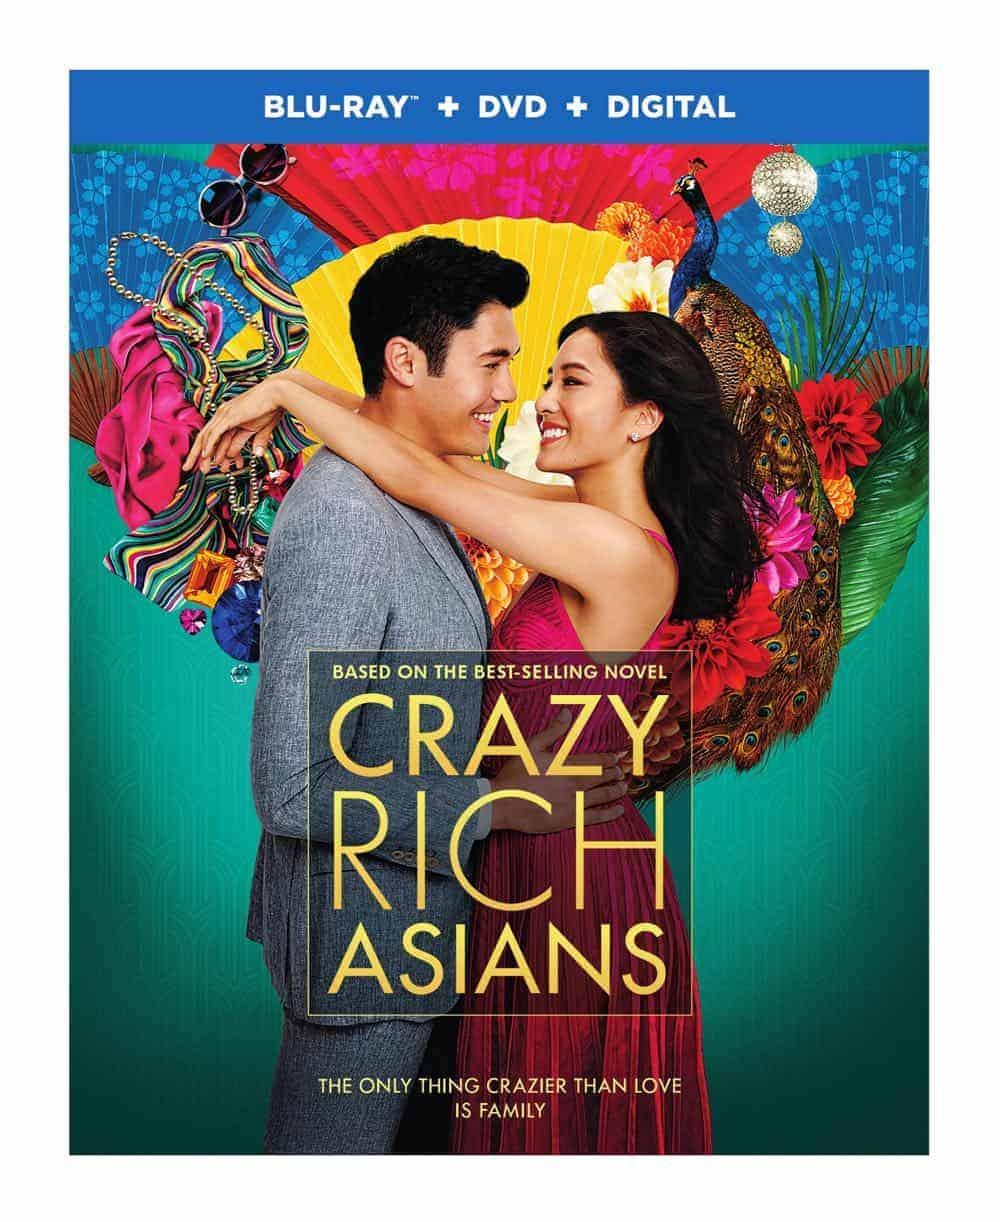 Crazy Rich Asians Bluray DVD Digital 2